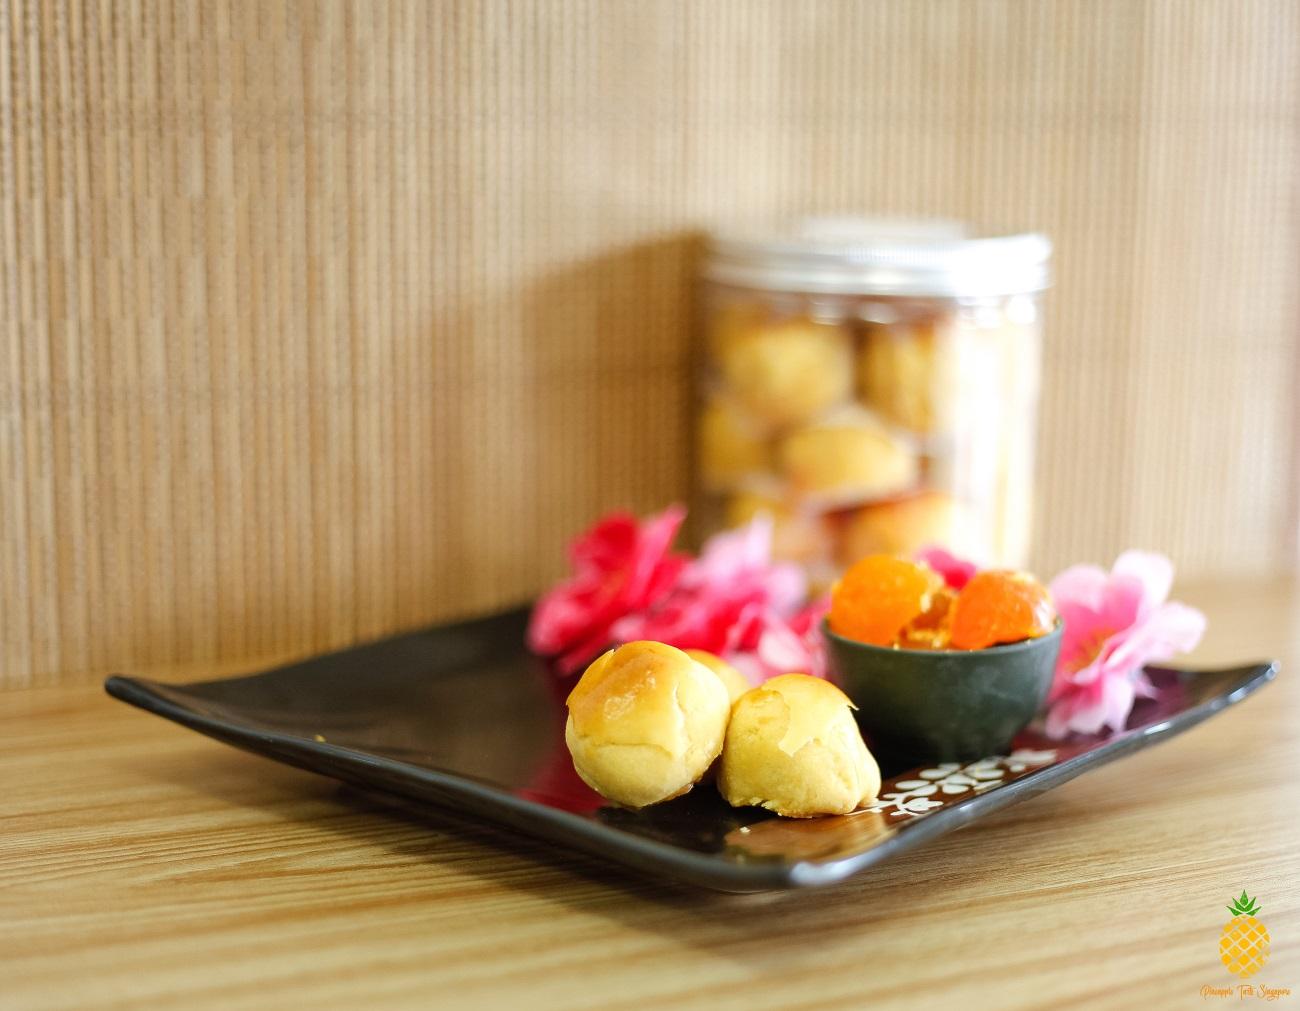 YOlkLO Salted Egg Pineapple Tarts - Pineapple Tarts Singapore